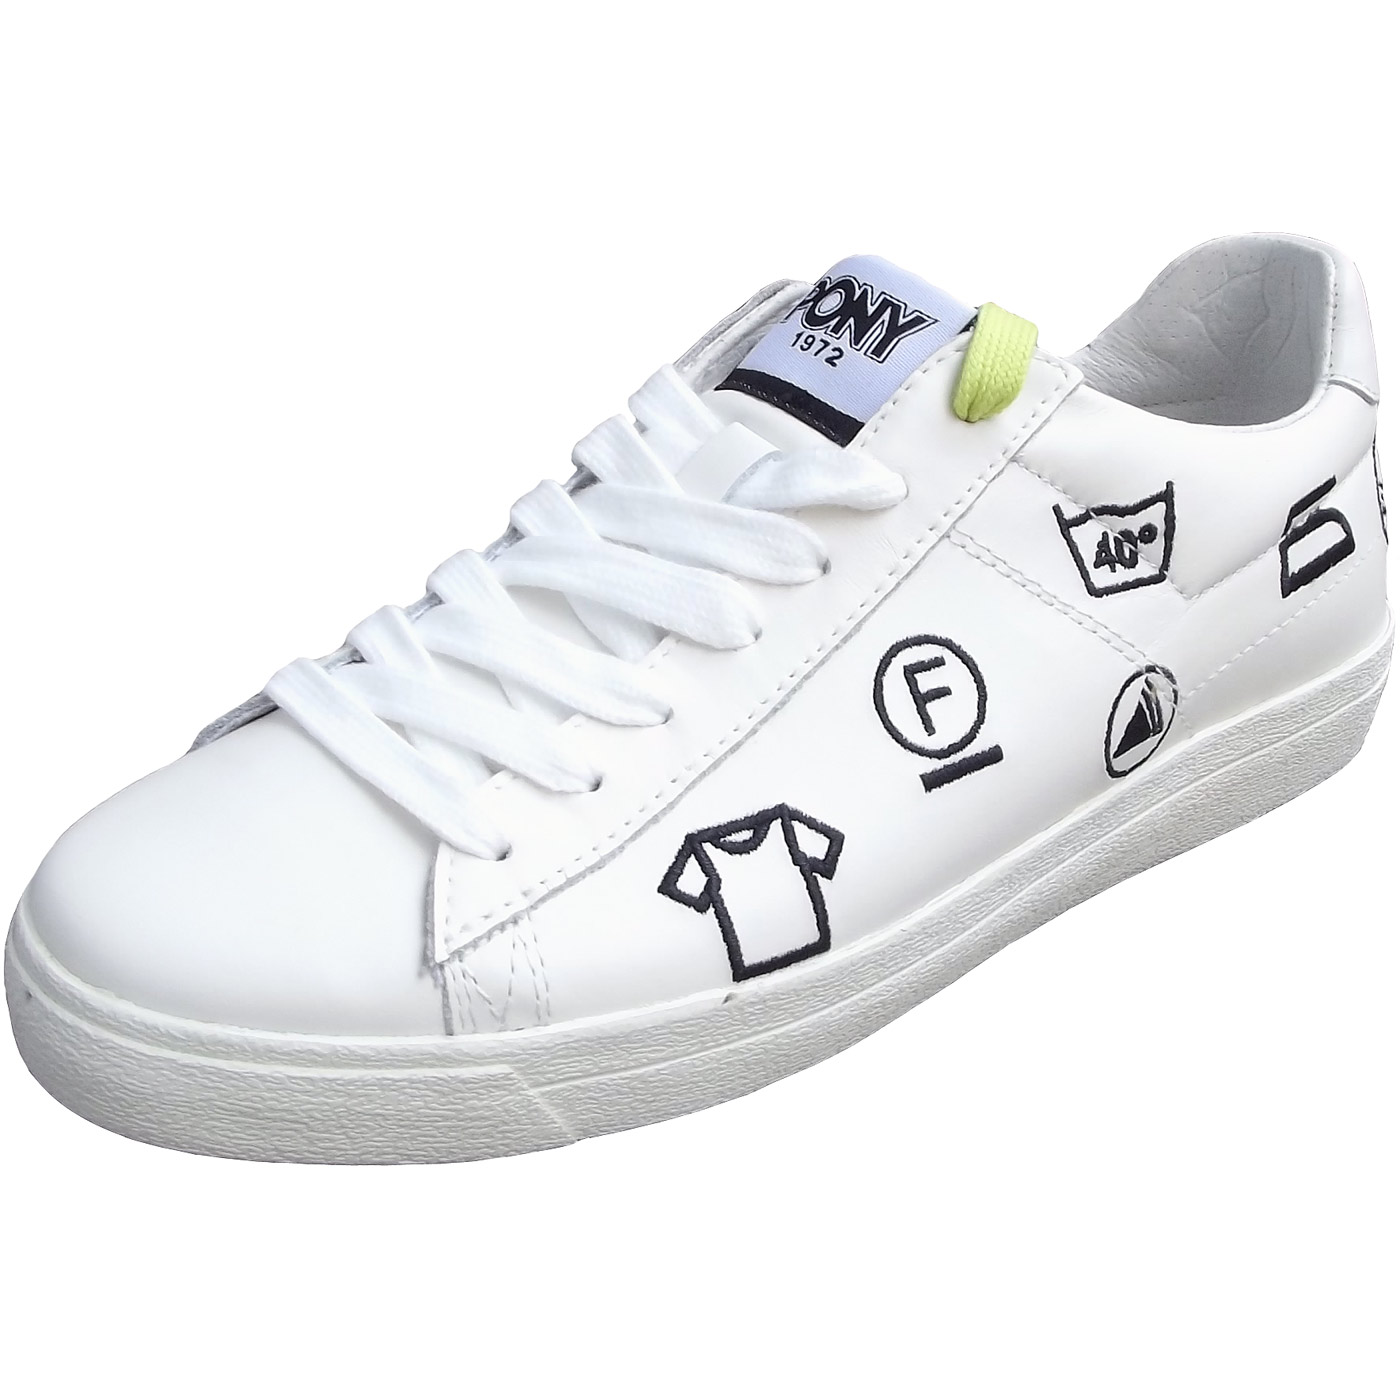 Pony Top Star Ox Women Sneakers white